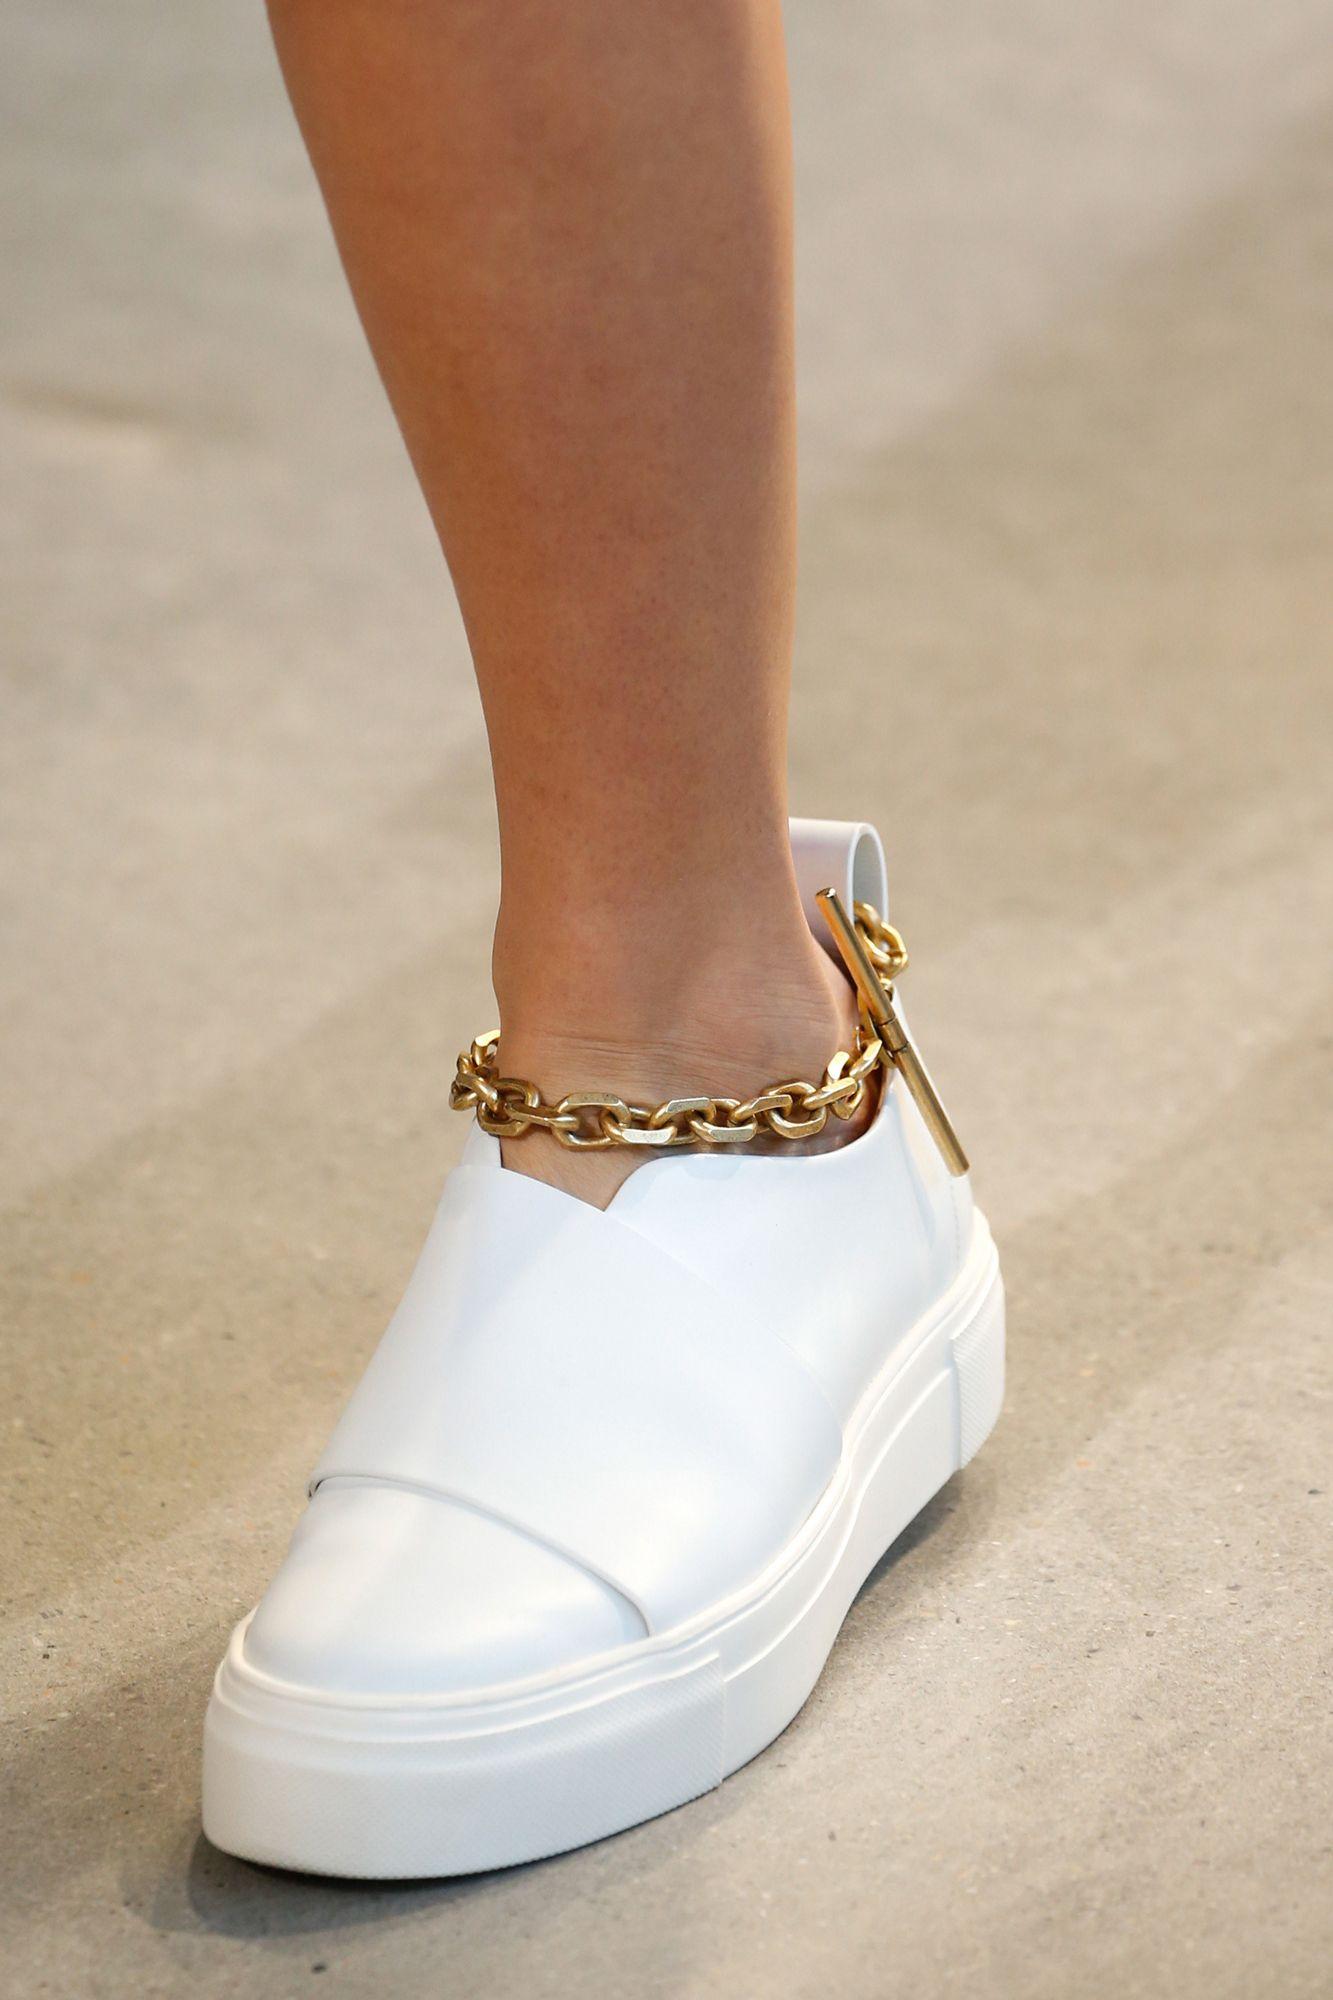 calvin klein gold anklet